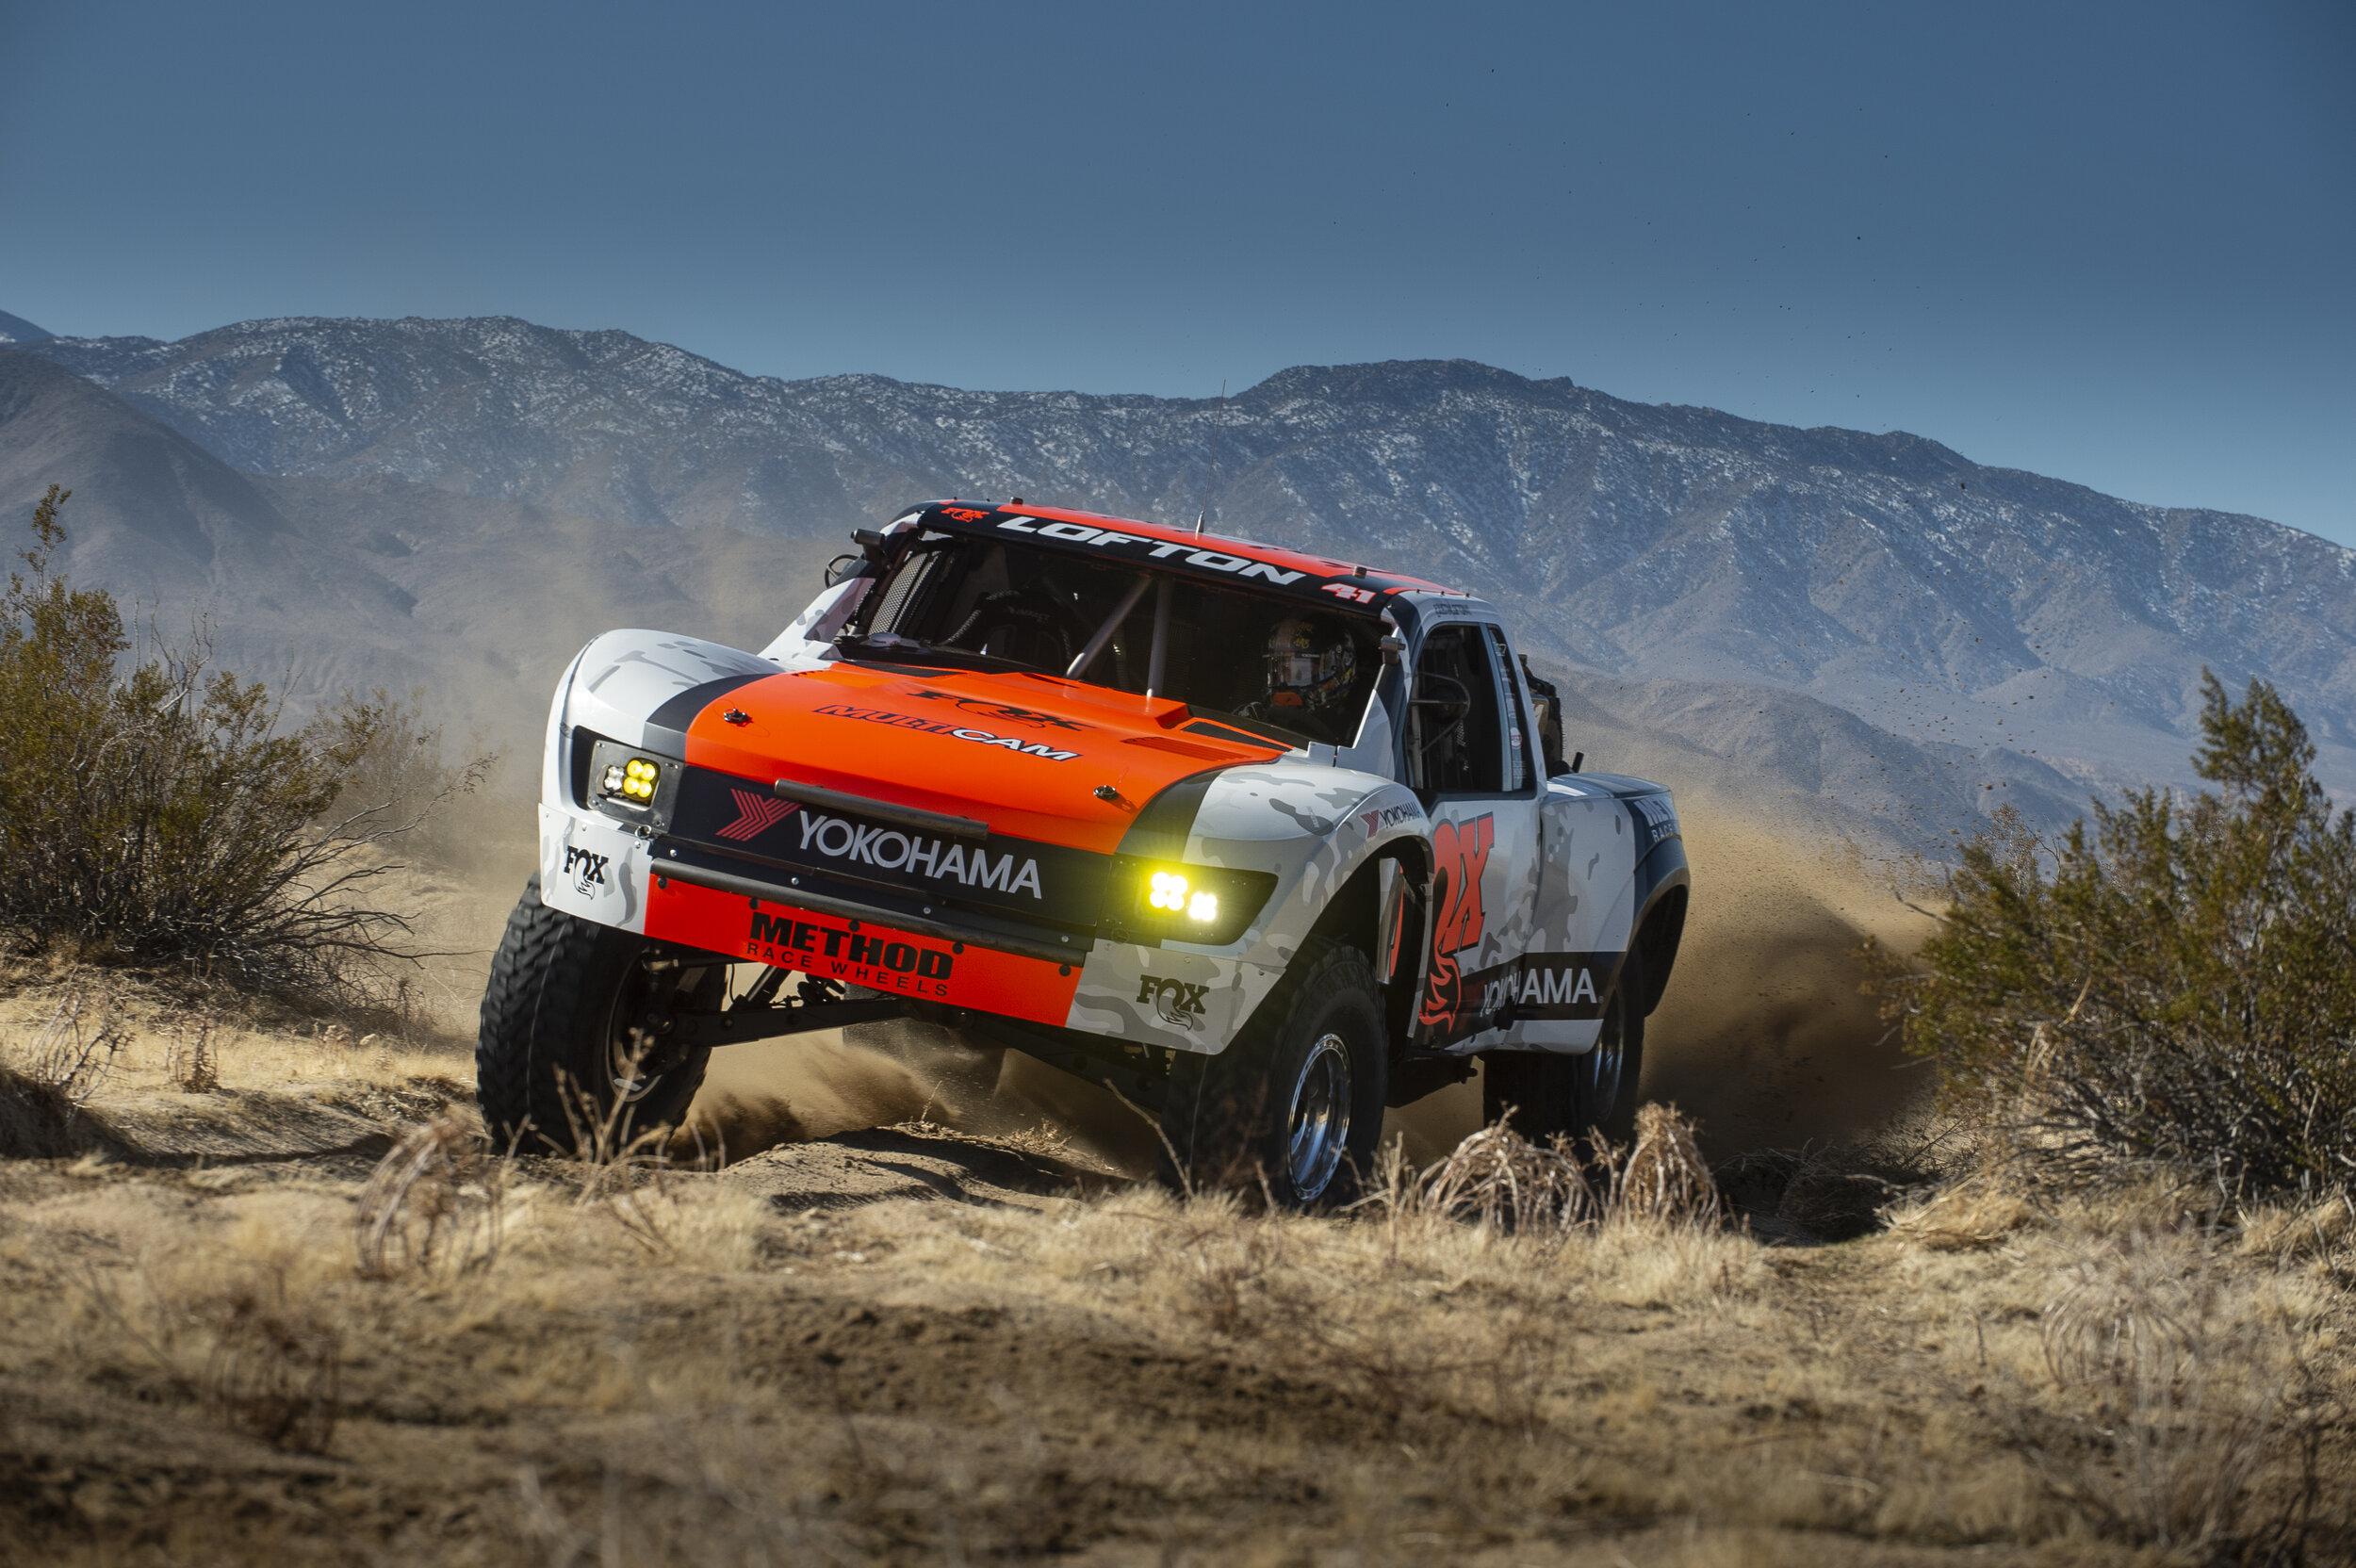 Justin Lofton Racing